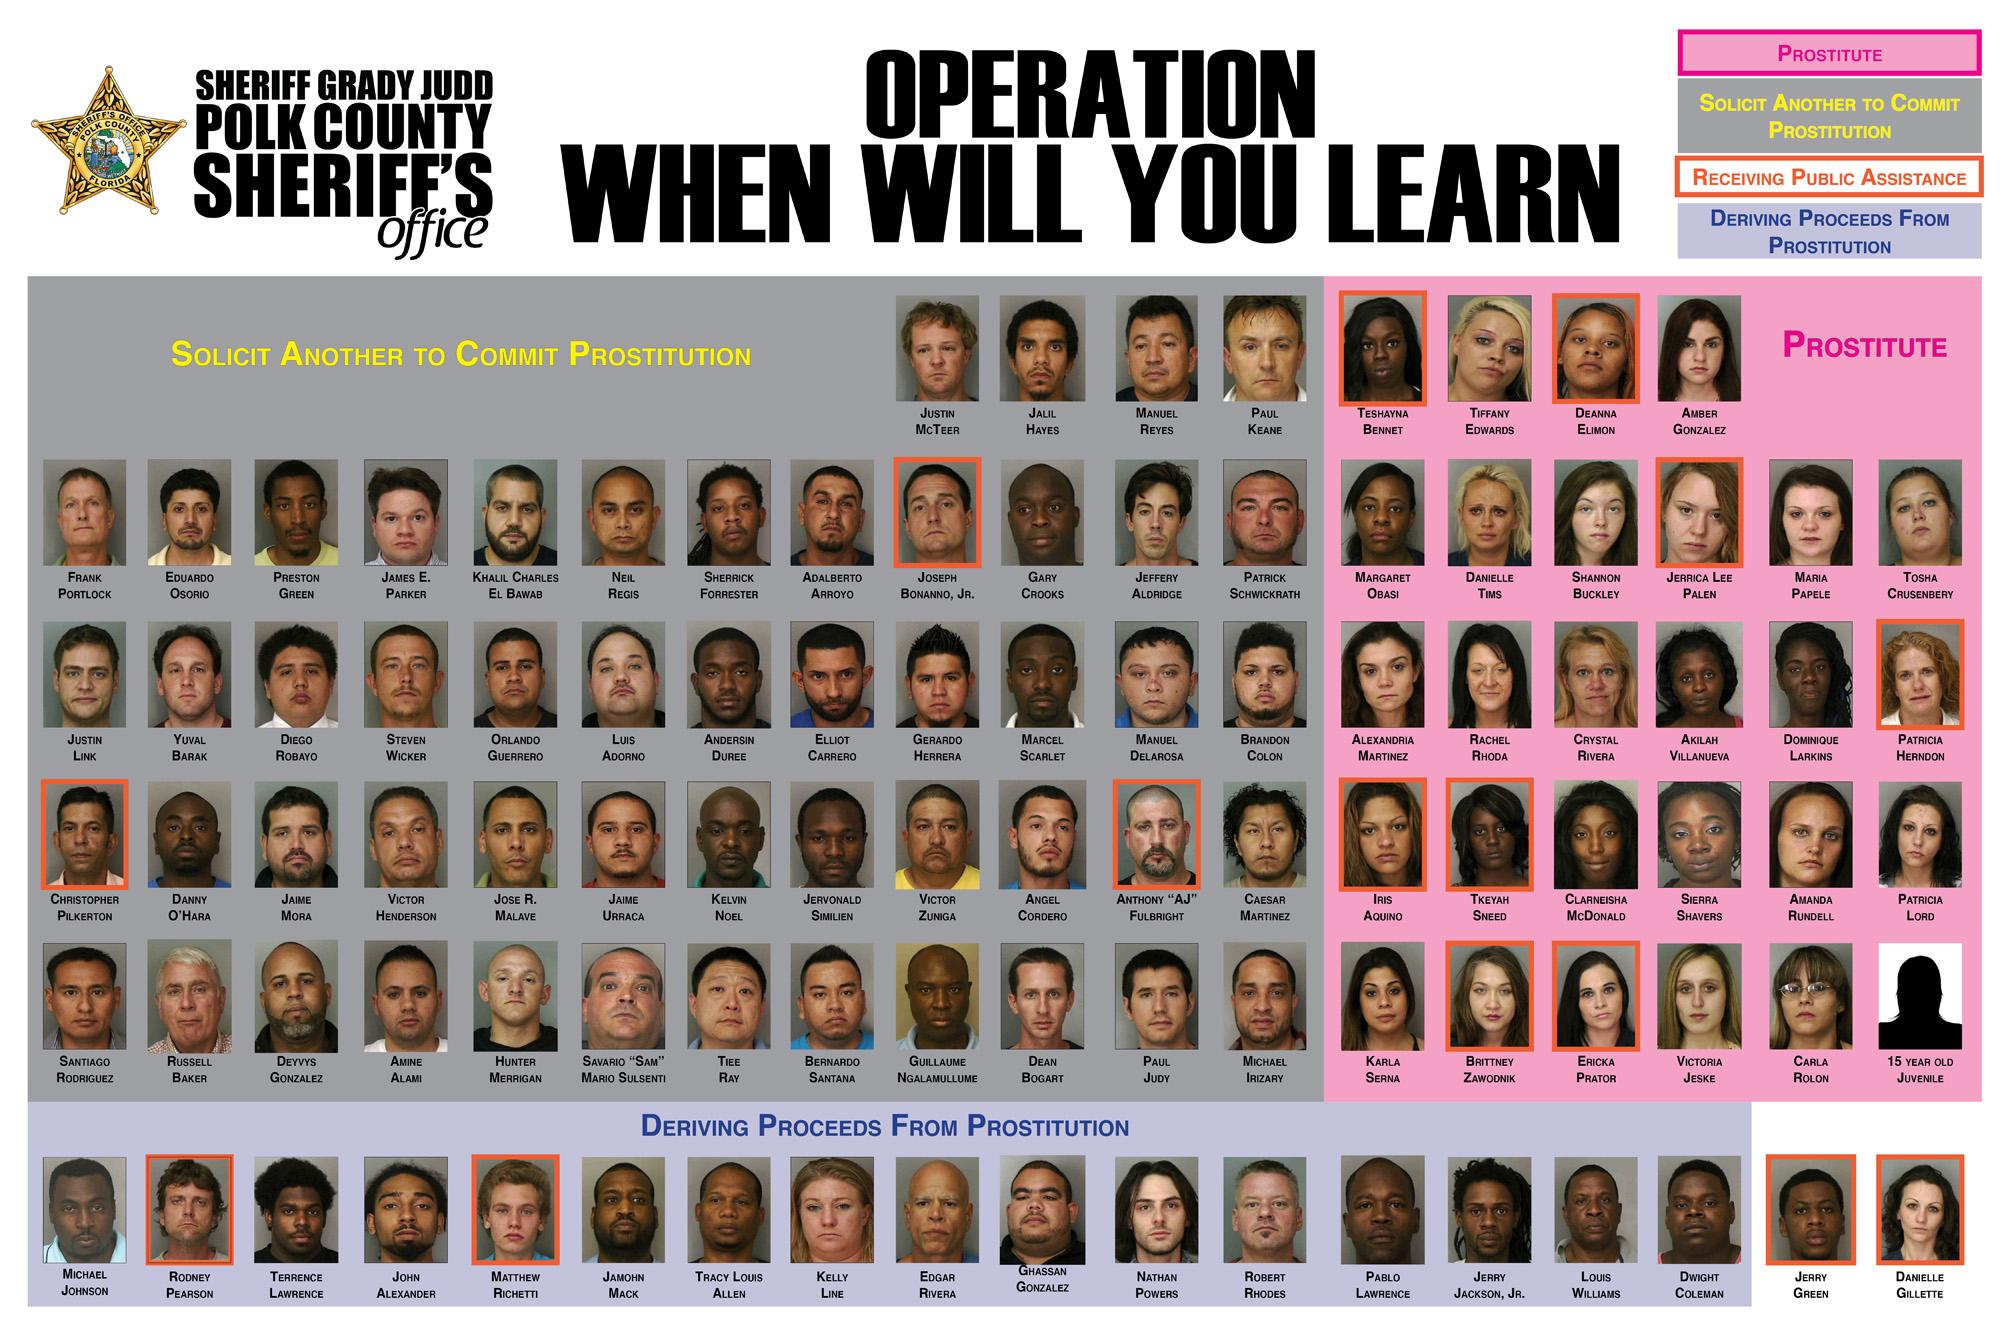 polk county, Grady judd, 98 arrested